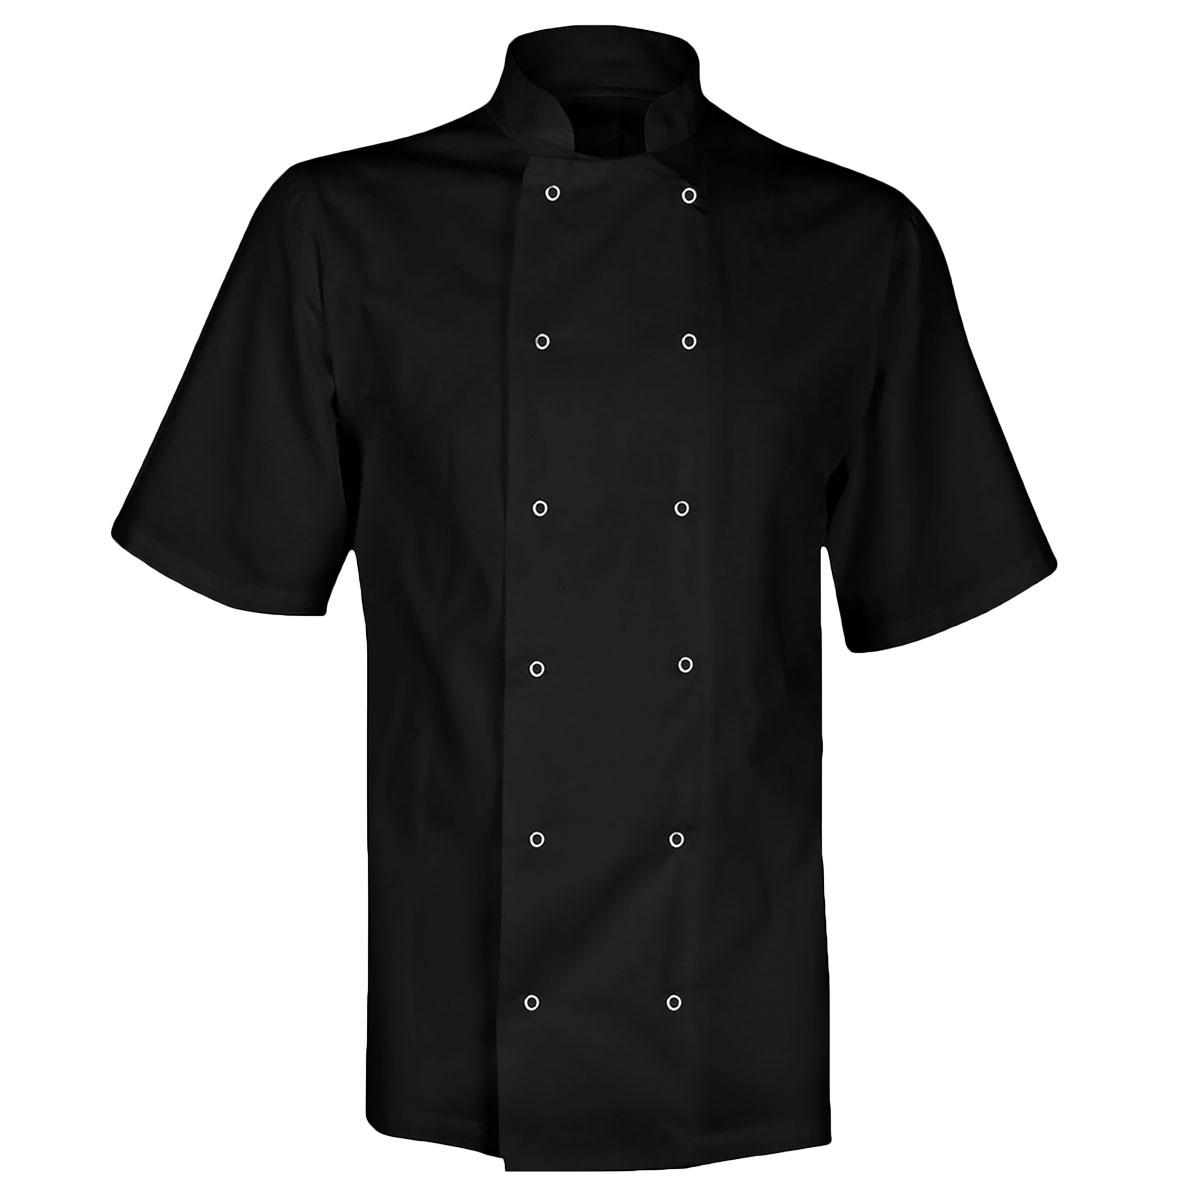 Value Chefs Jacket Unisex Short Sleeve - CCJ1-BLACK